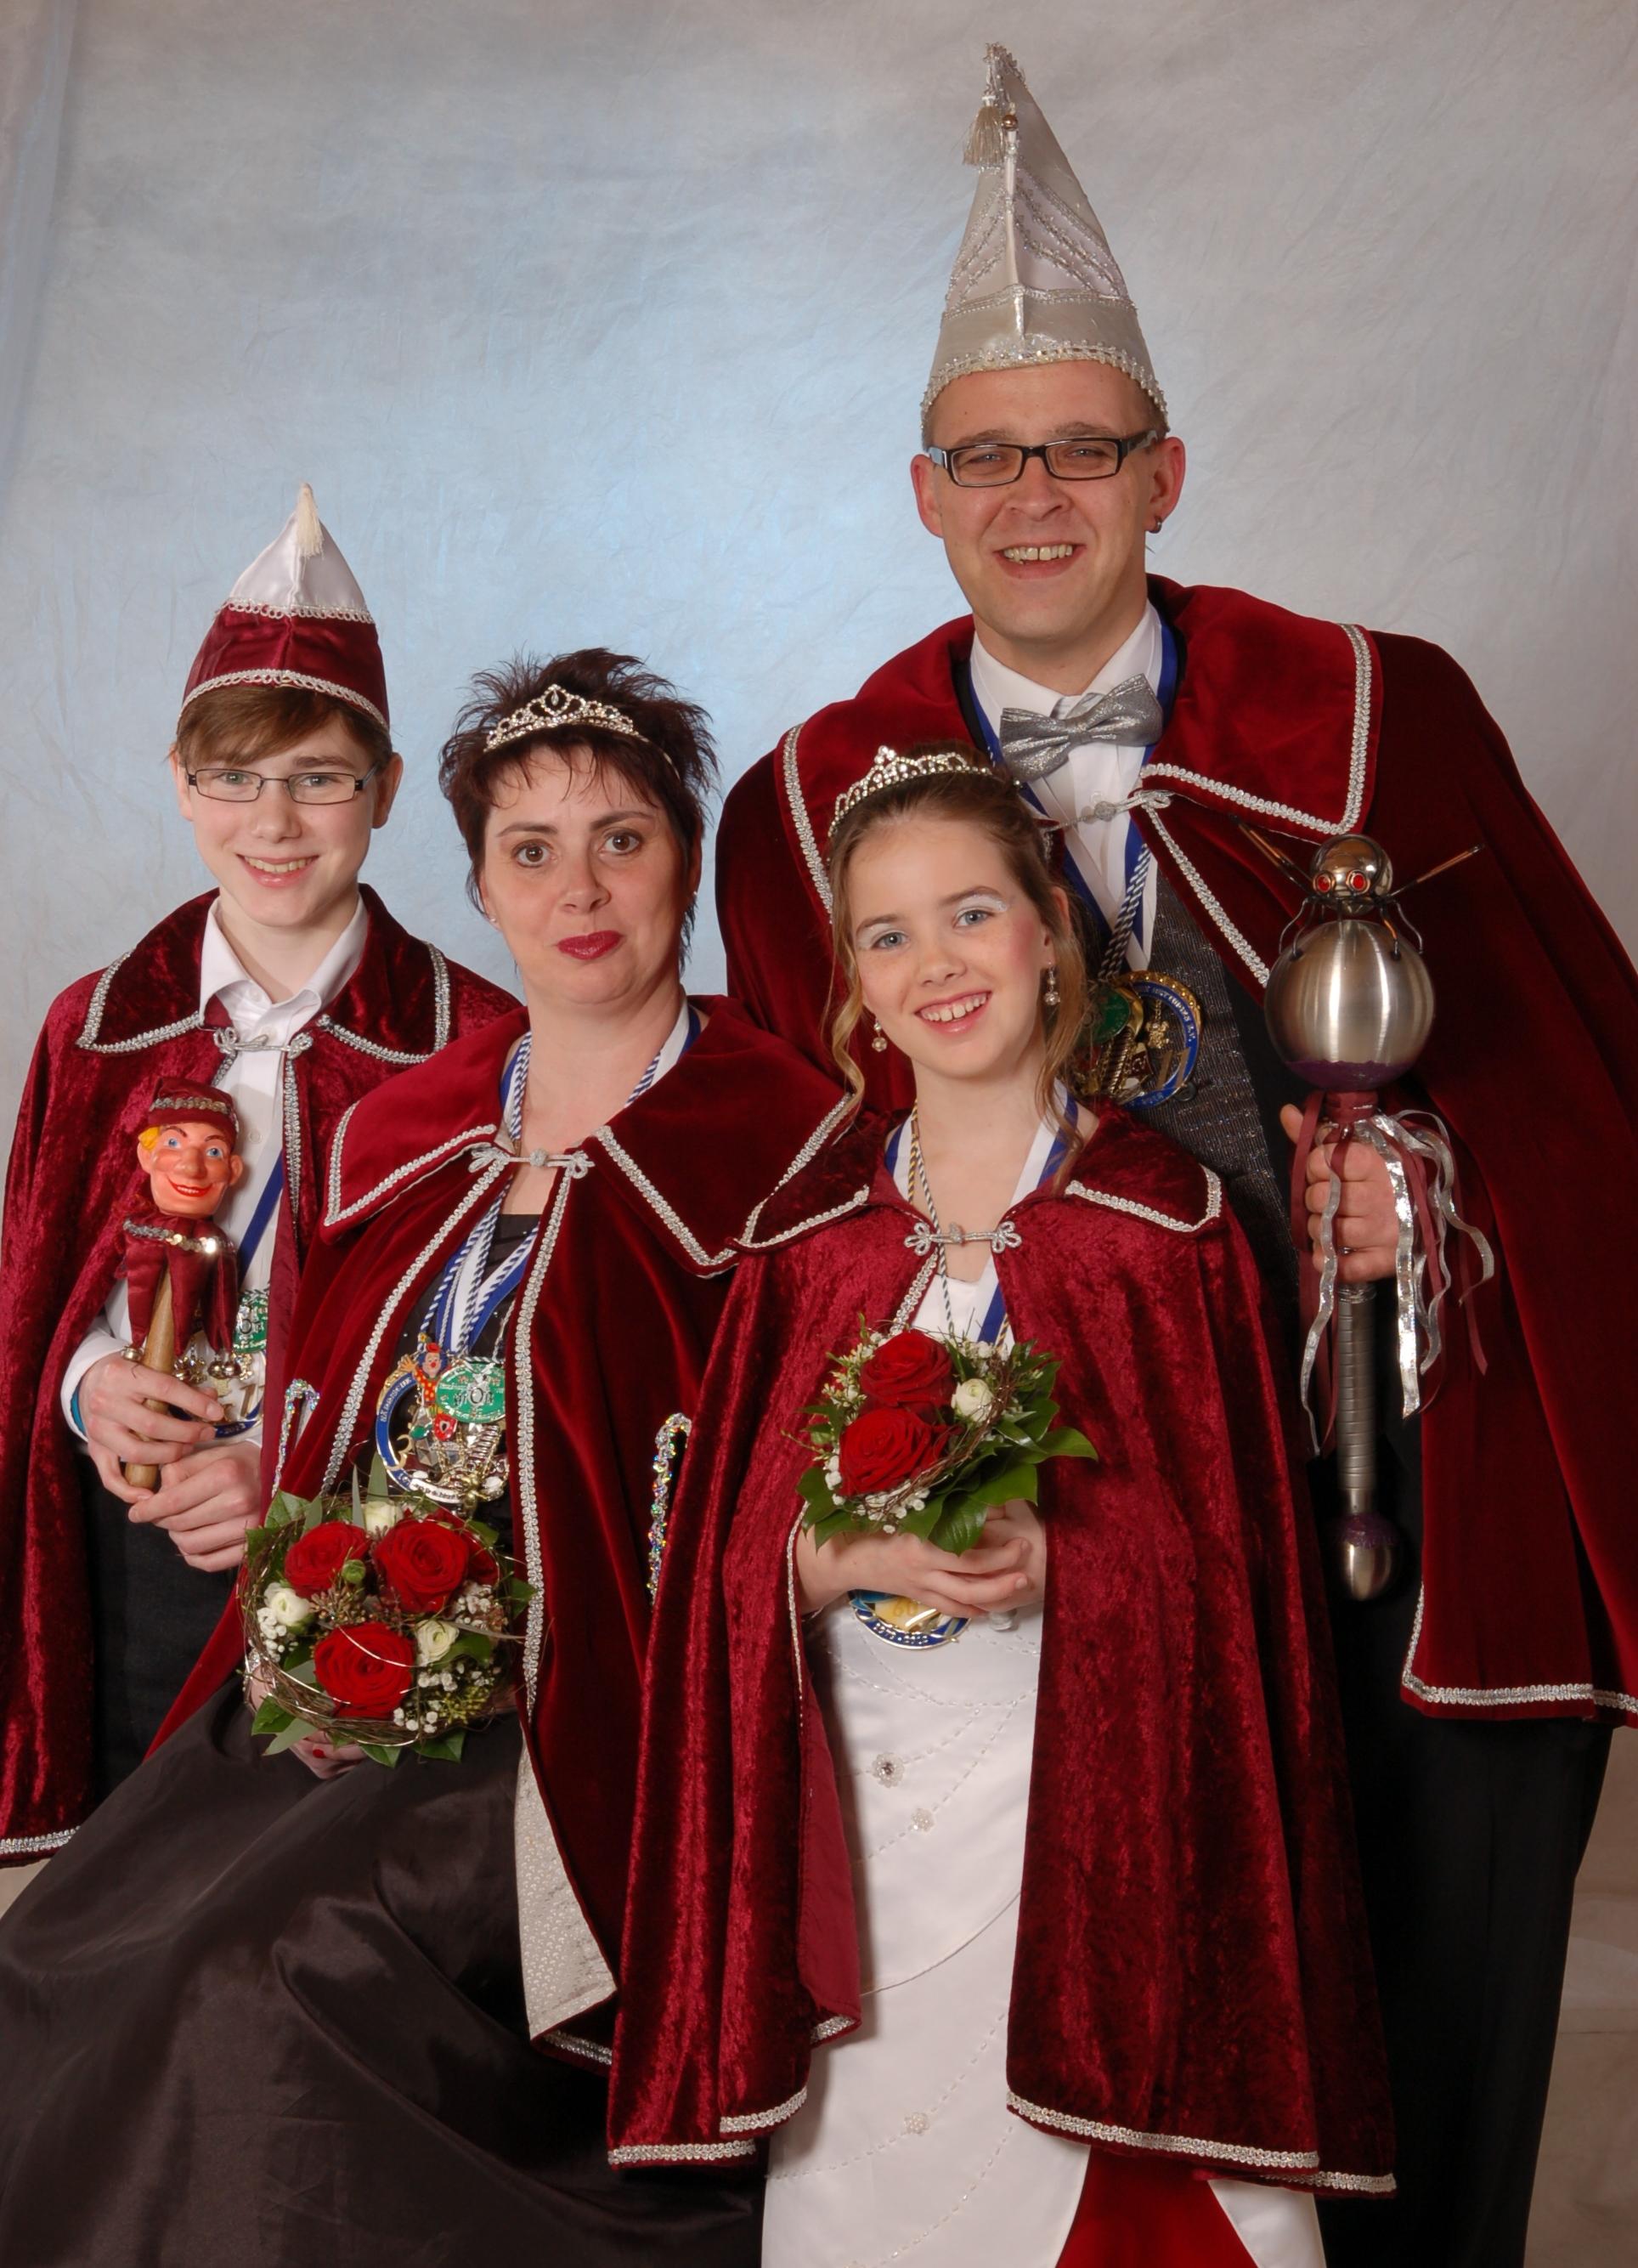 Faschingsprinzessing Tanja I. mit Dirk I. und dem Kinderprinzenpaar Alina I. und Bastian I.